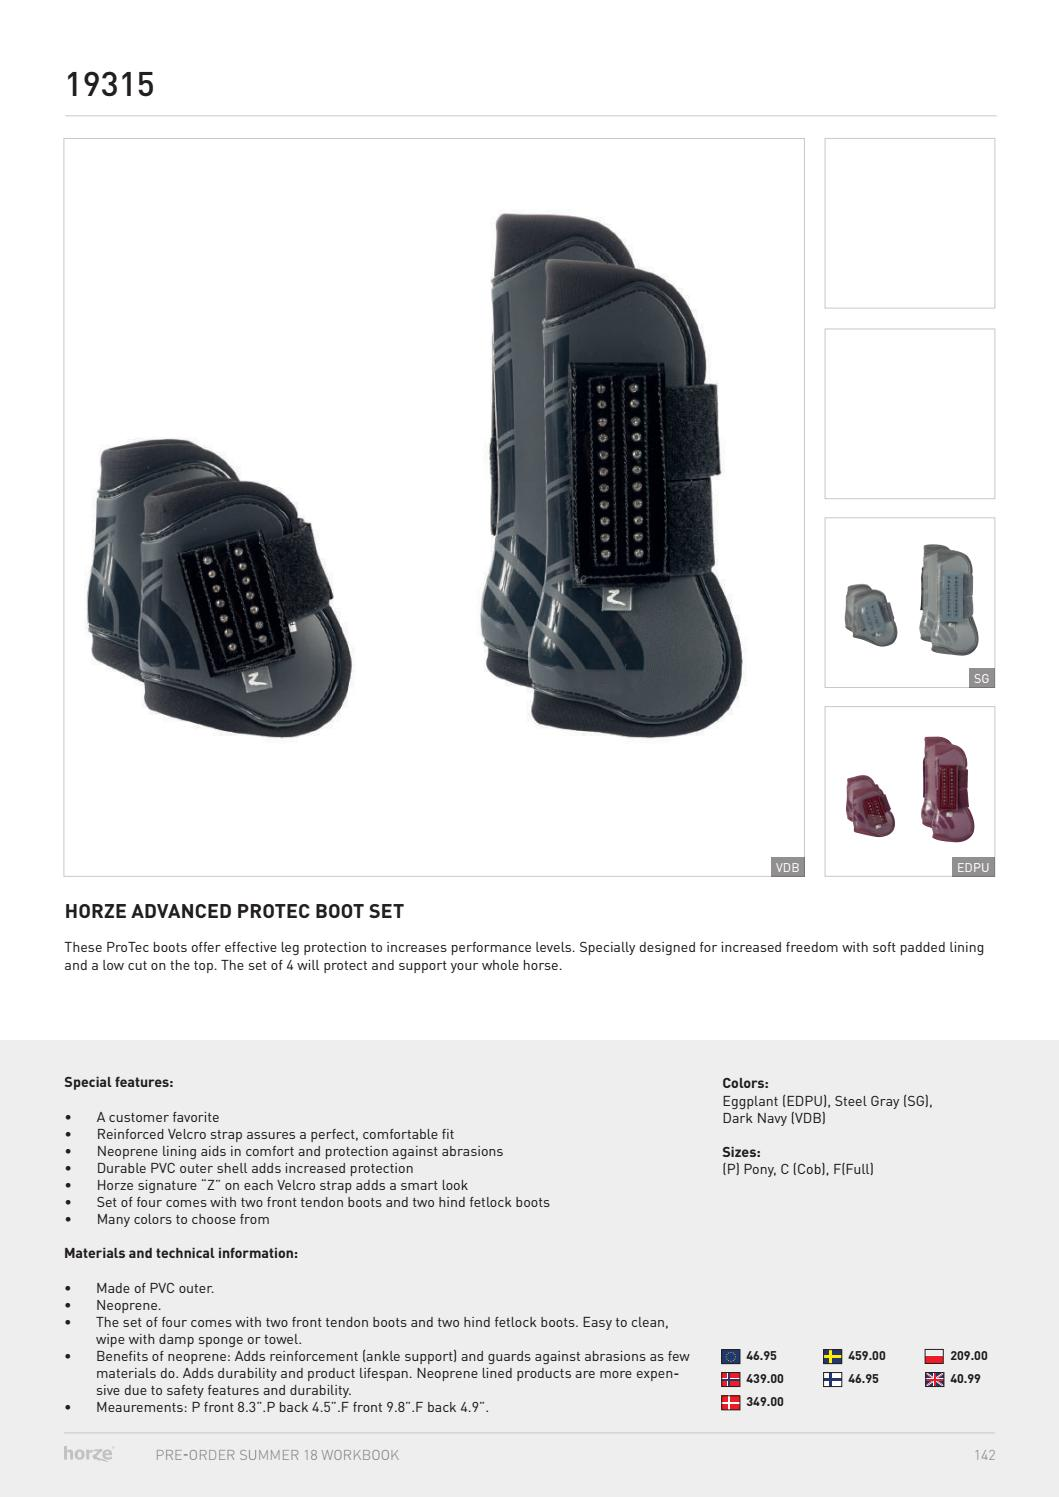 Proform E35S Tread Rear Roller Model Number PFTL69710 Part Number 187669